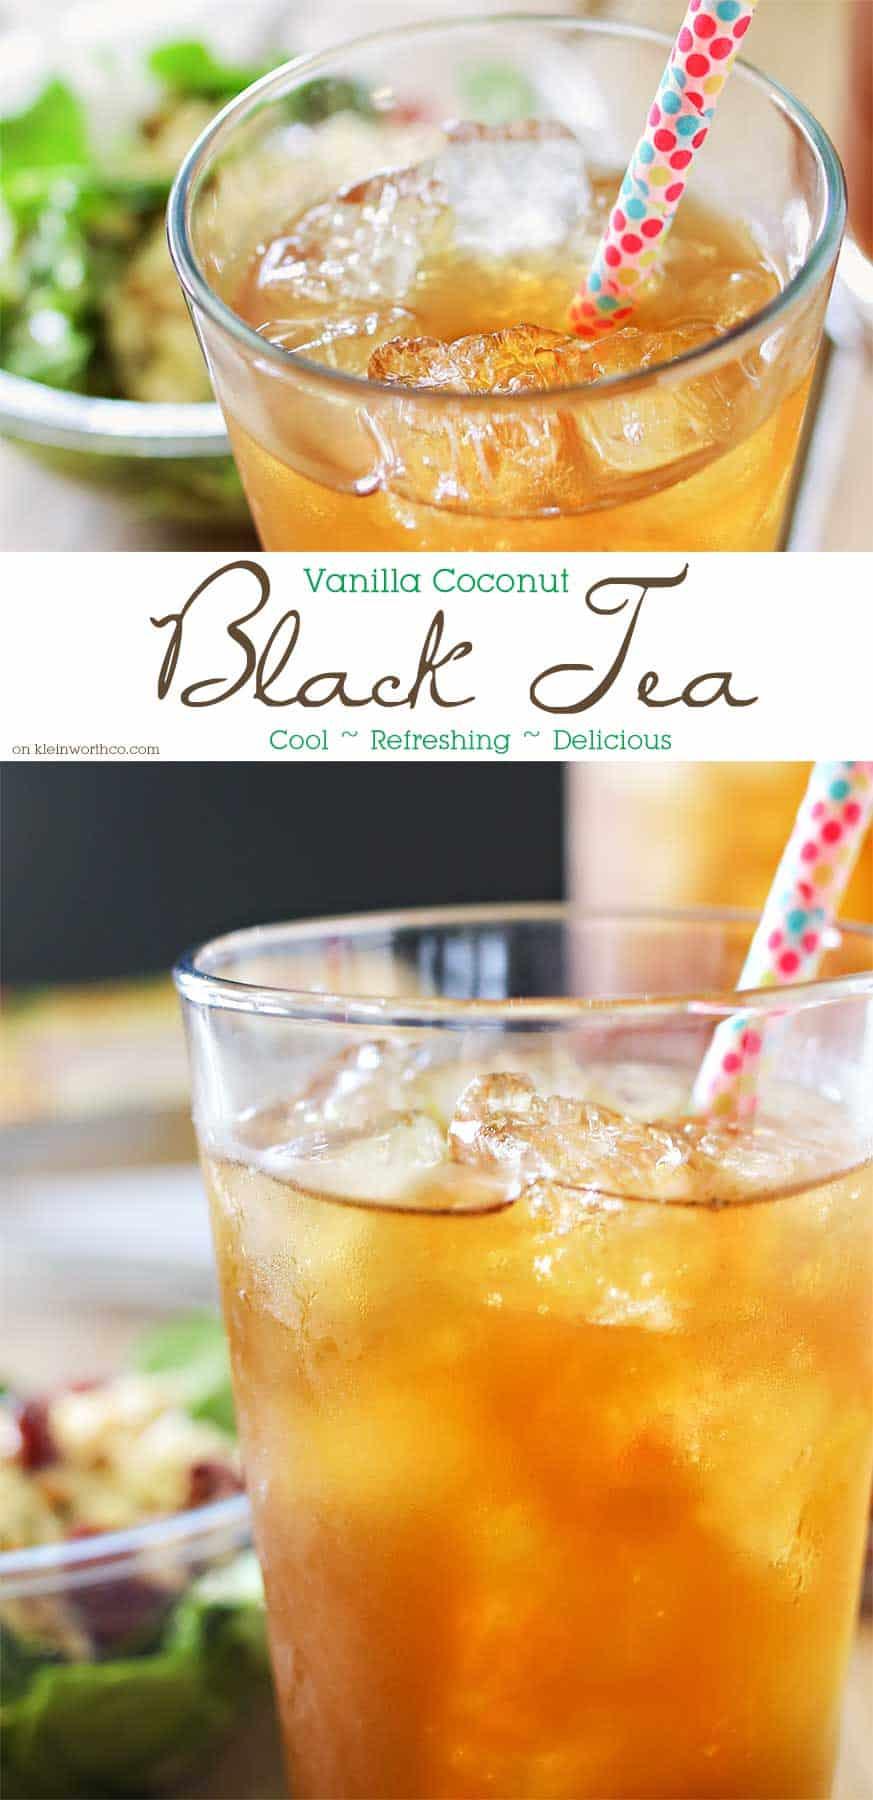 Vanilla coconut iced black tea